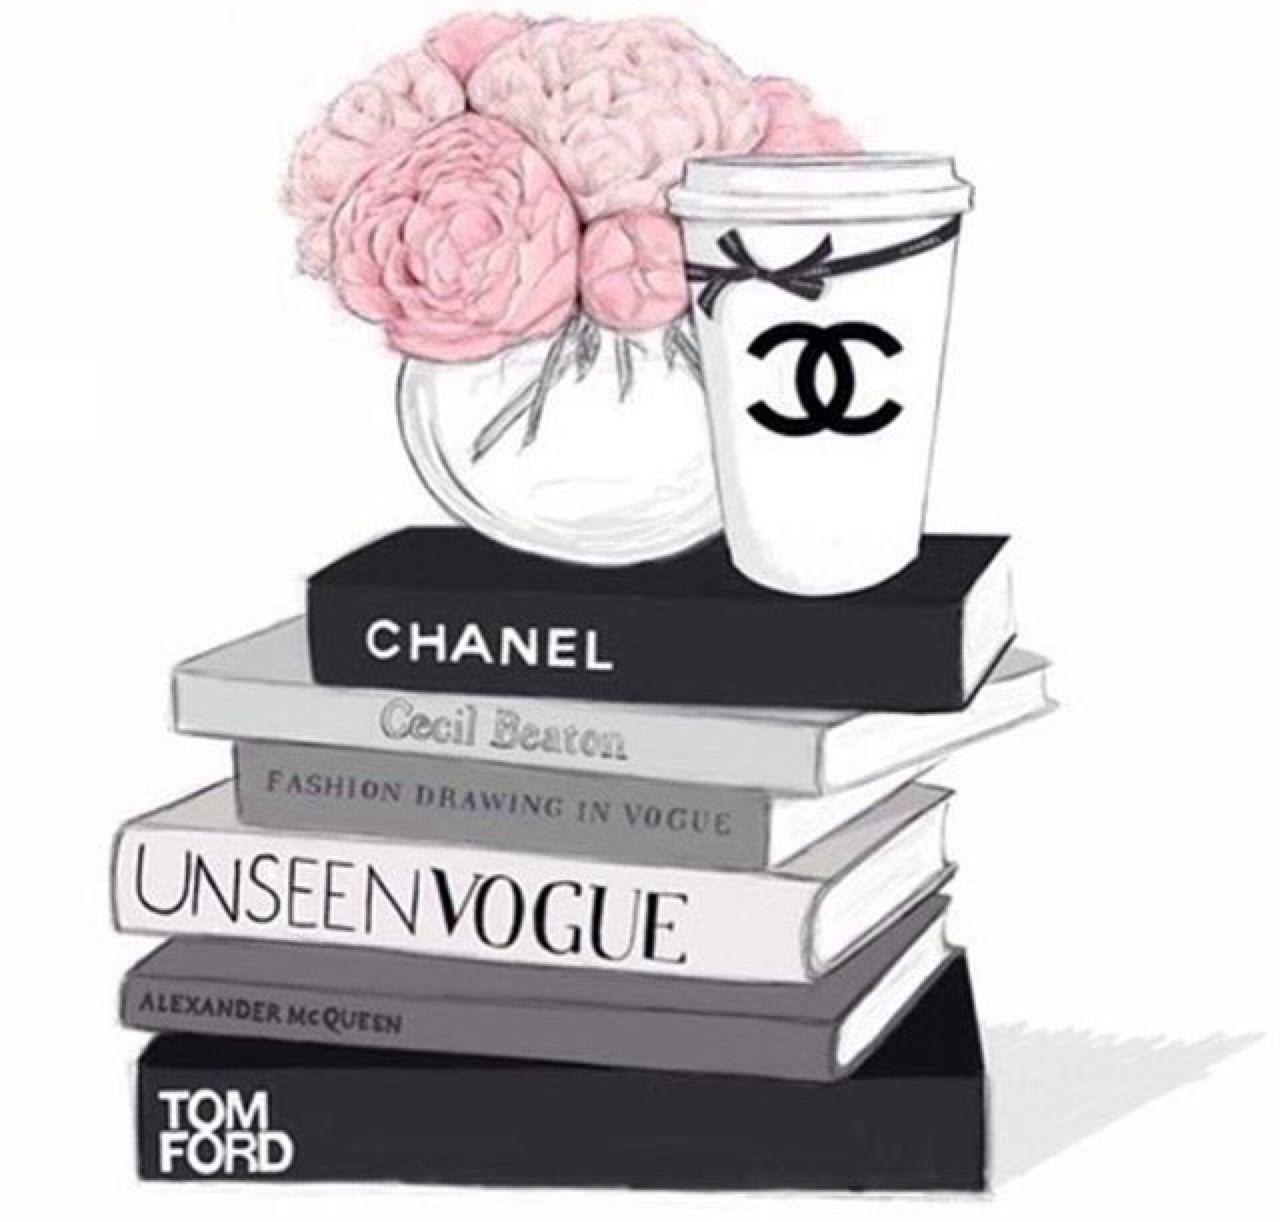 Coco Chanel Wall Stickers ̗̀♔ Pinterest Thania835 ♔ ̖́ Artwork Pinterest